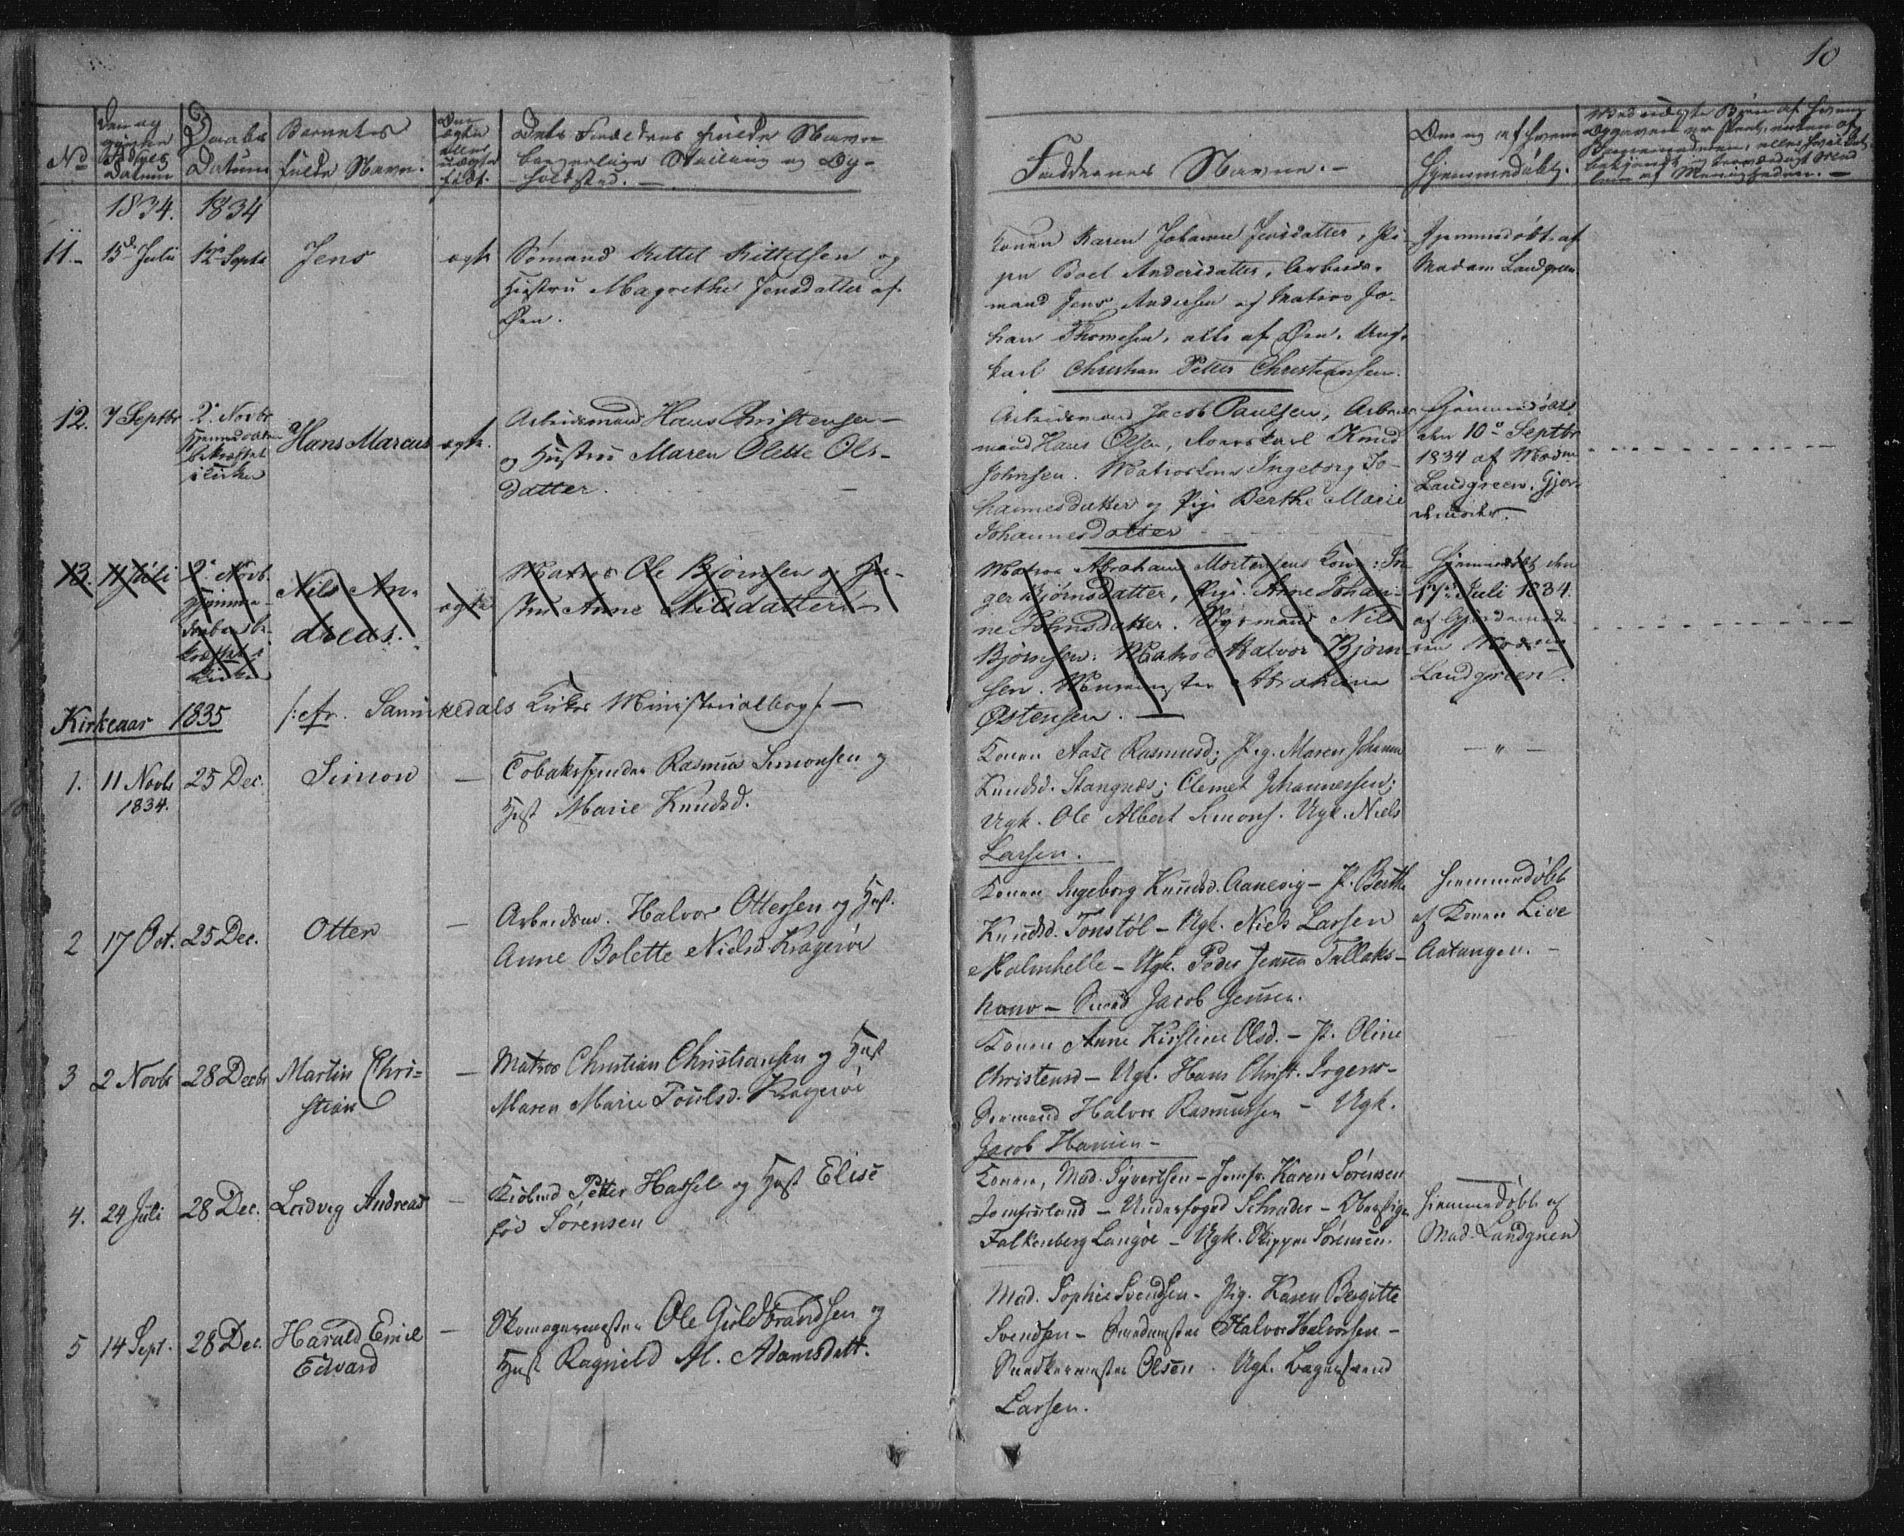 SAKO, Kragerø kirkebøker, F/Fa/L0005: Ministerialbok nr. 5, 1832-1847, s. 10